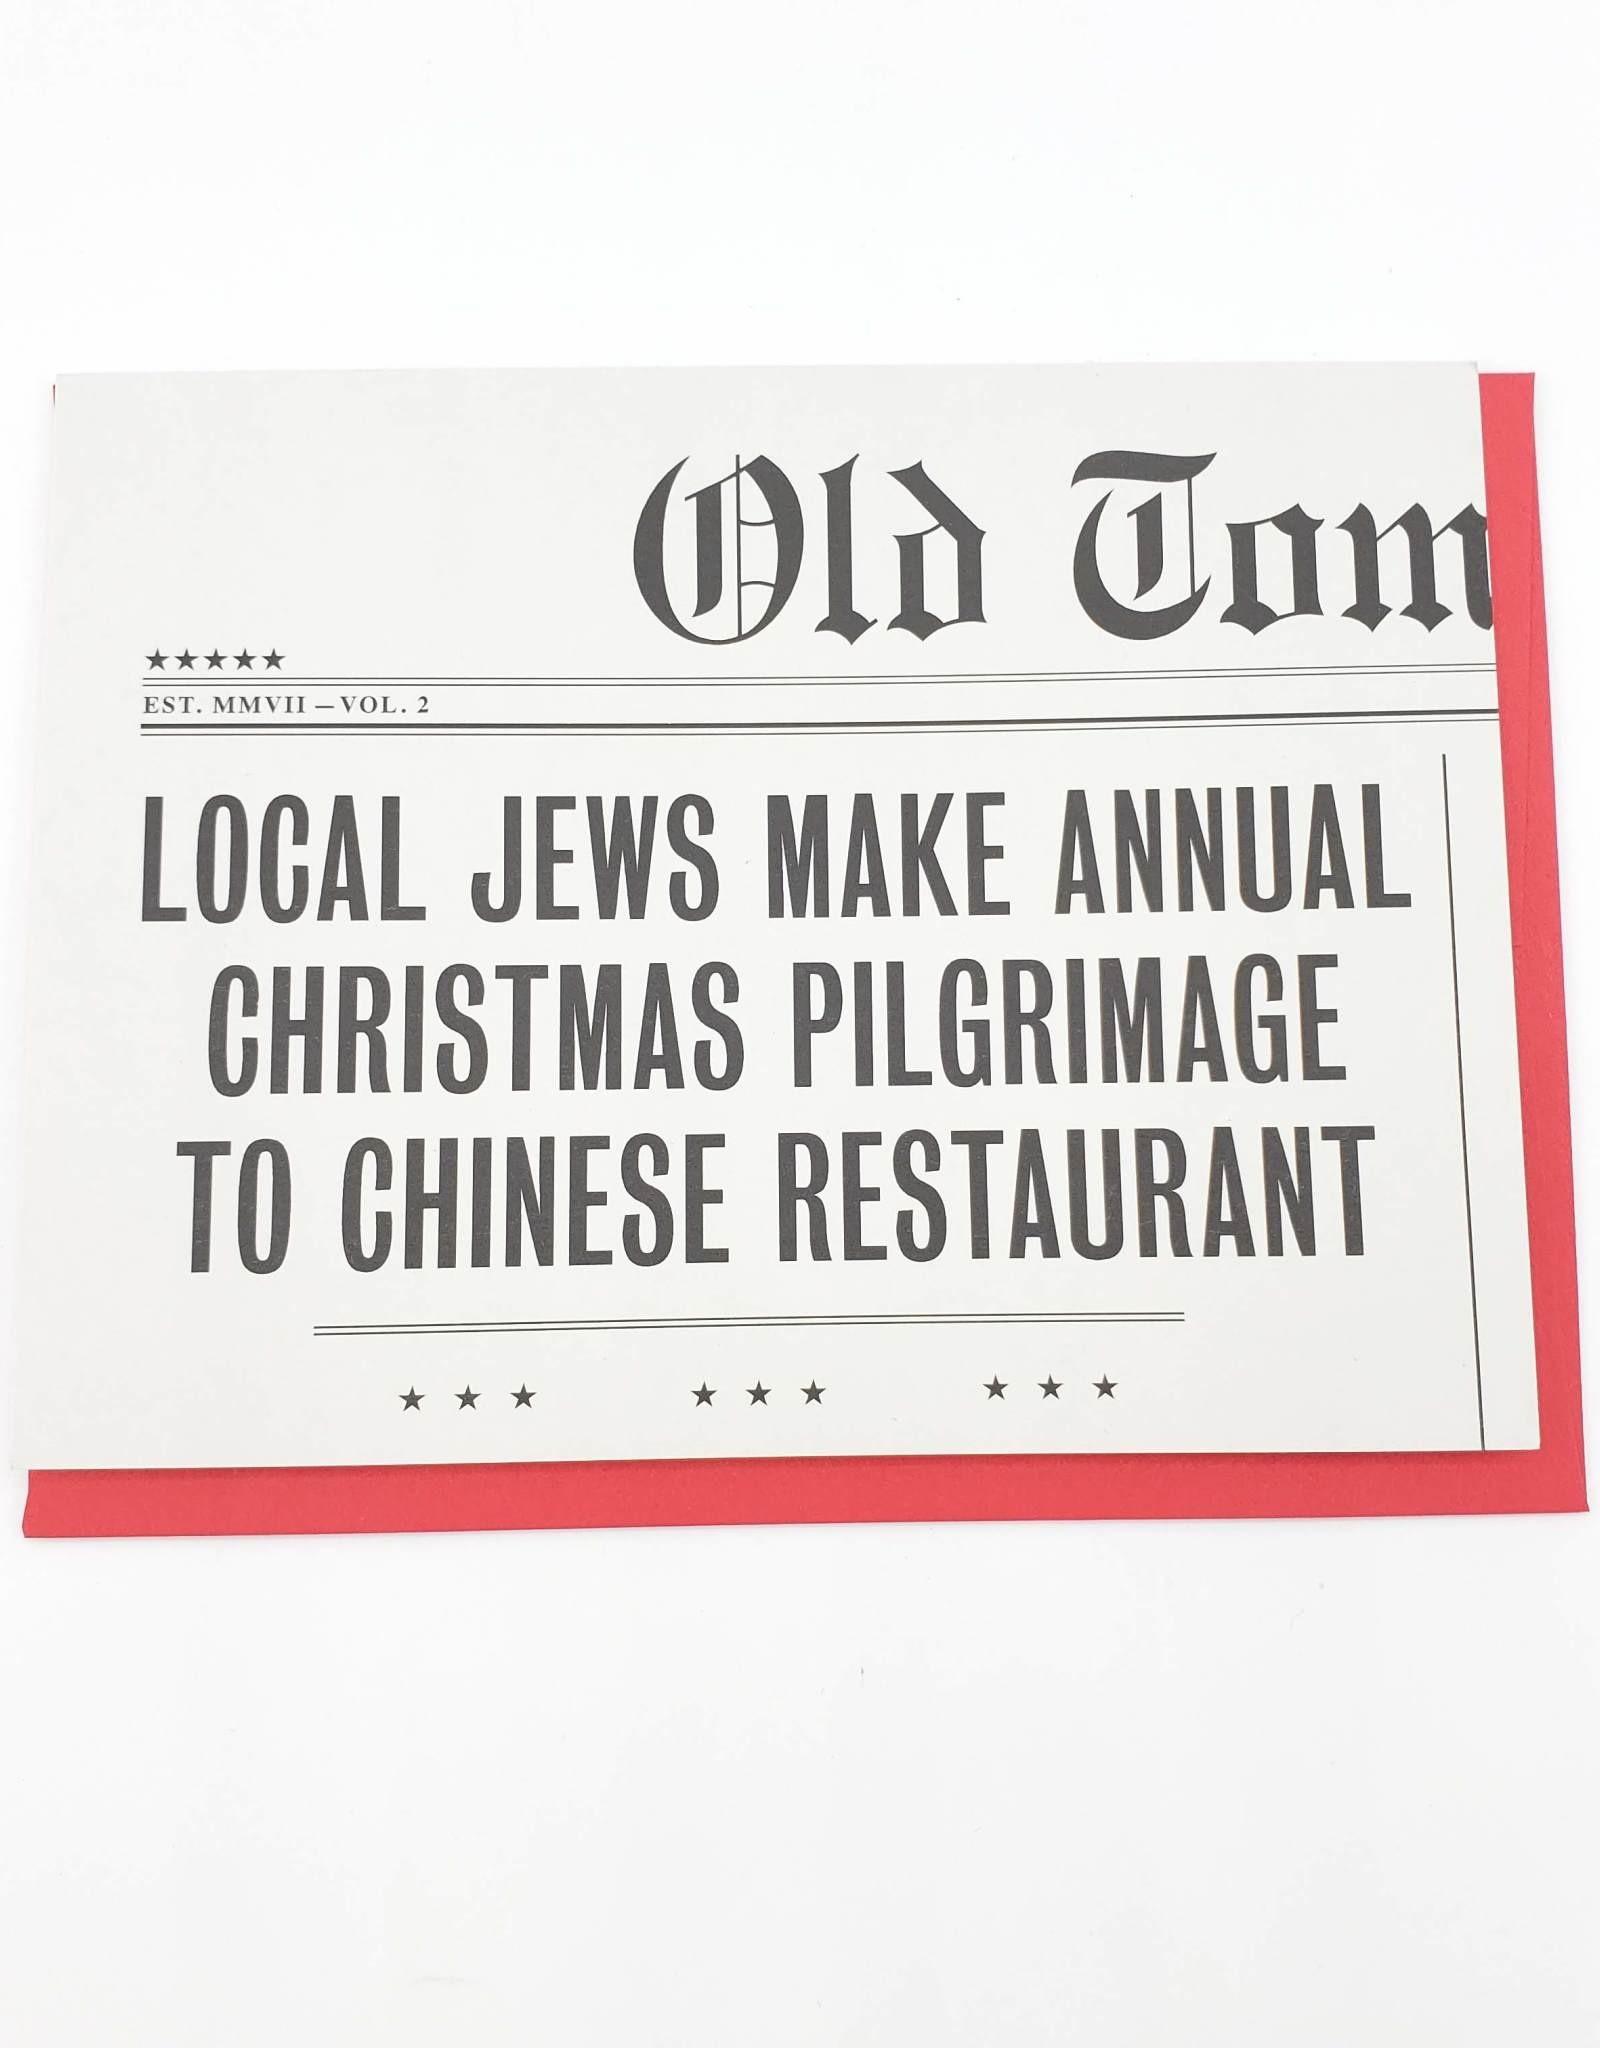 Chinese Restaurant Hanukkah Greeting Card - Old Tom Foolery